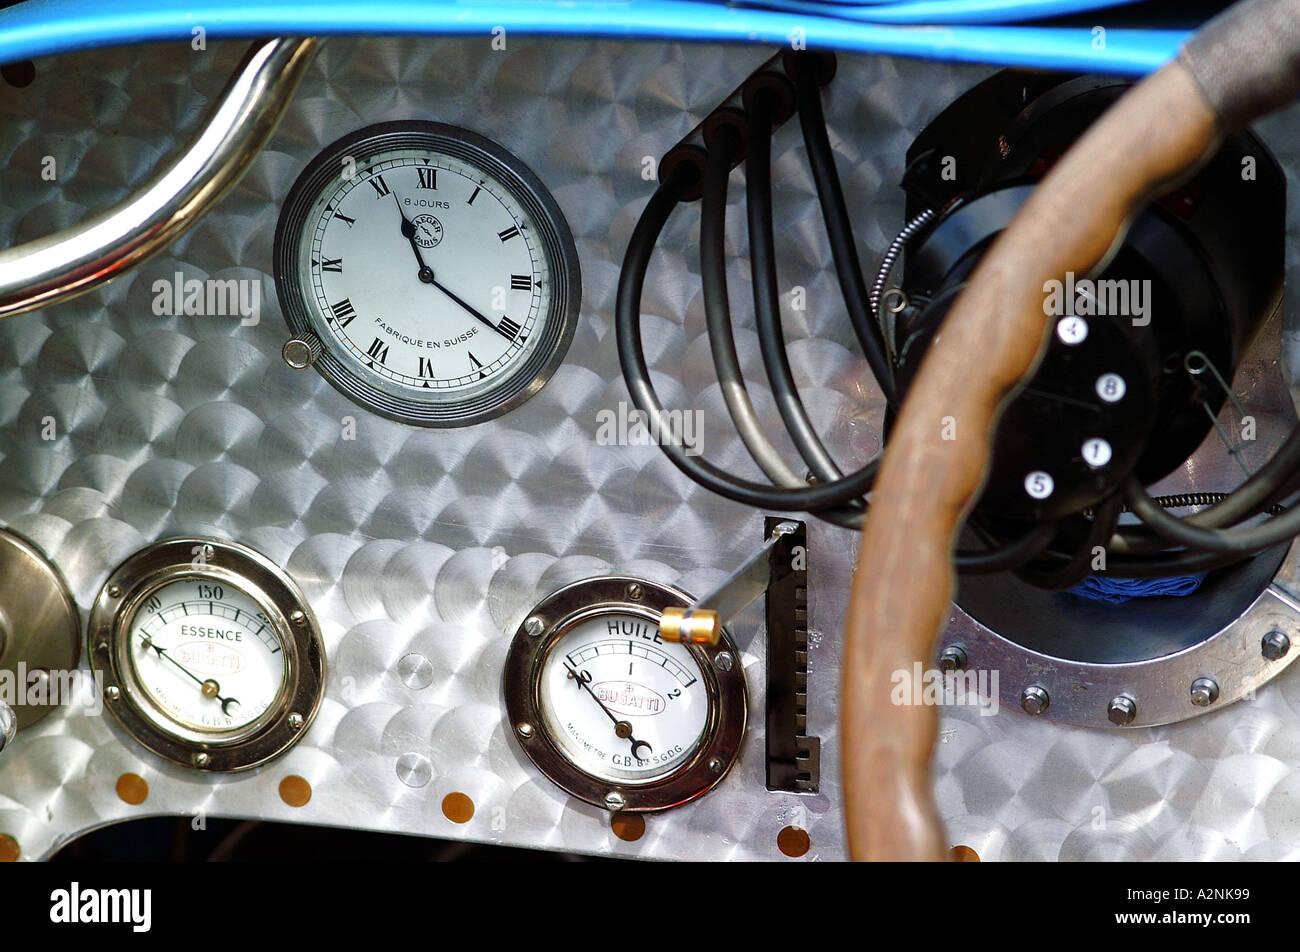 Historic racing car dashboard - Stock Image